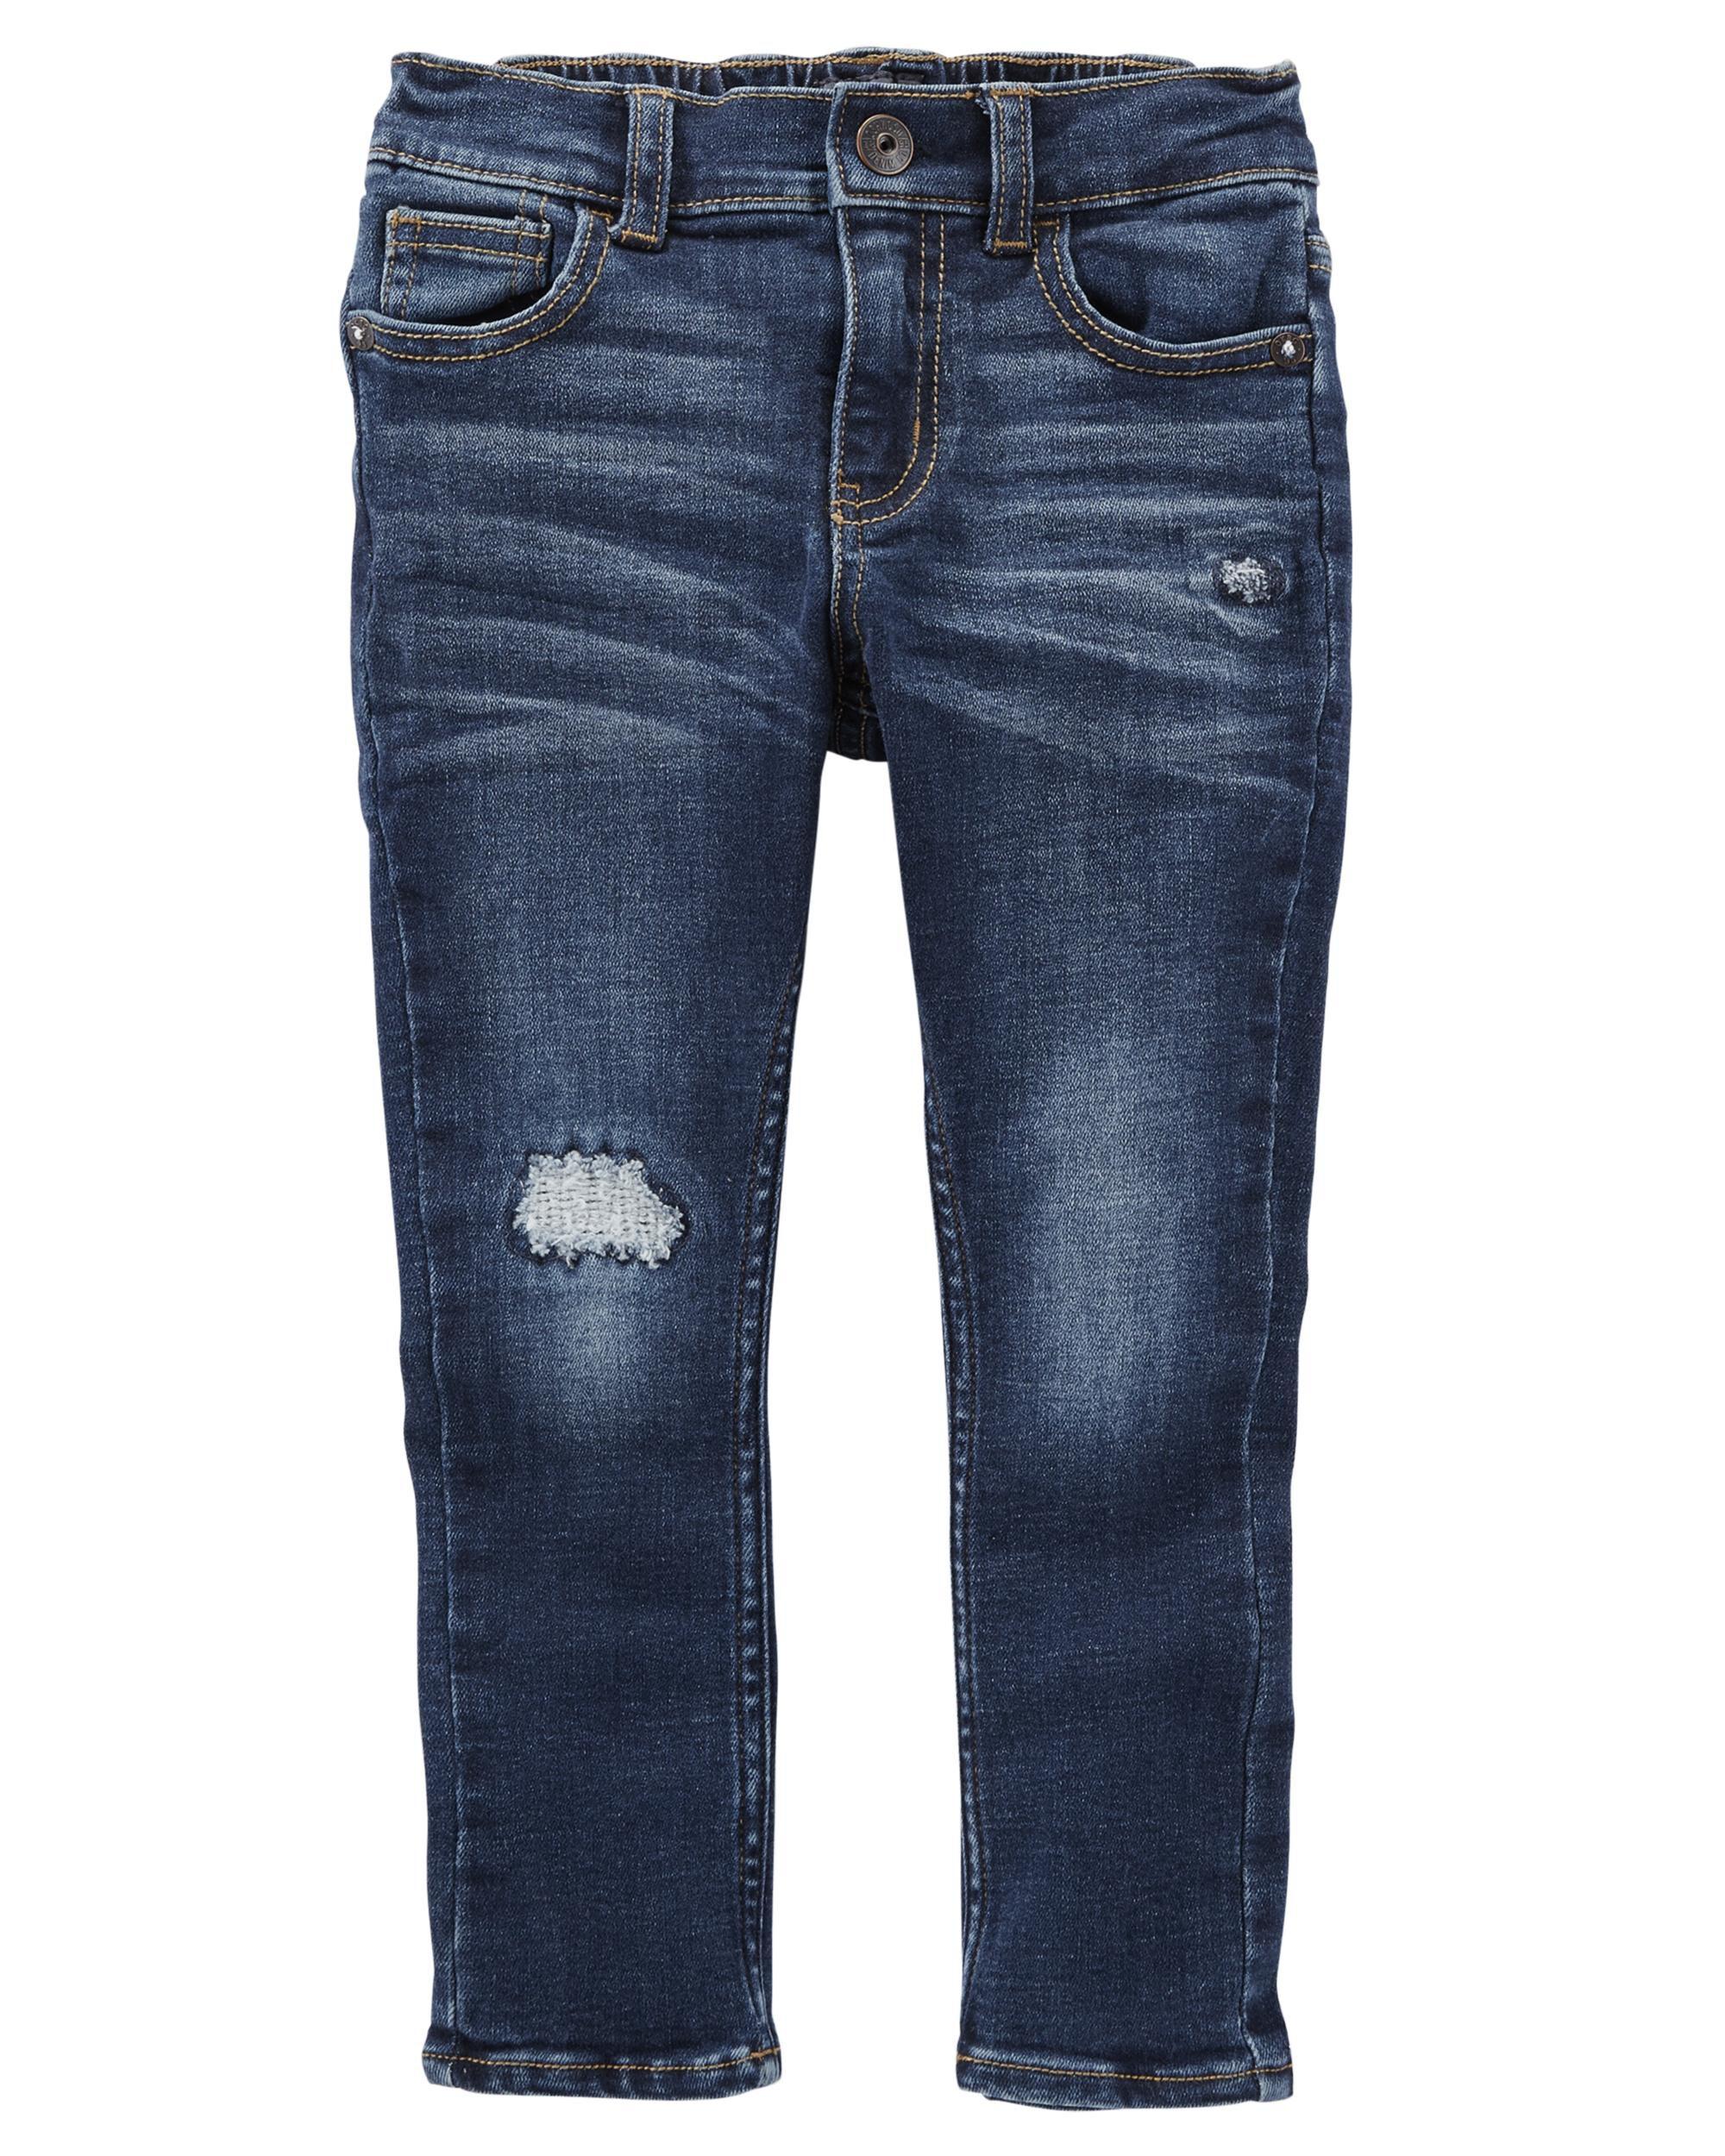 Rip-&-Repair Slim Stretch Jeans - Dark Ocean Wash